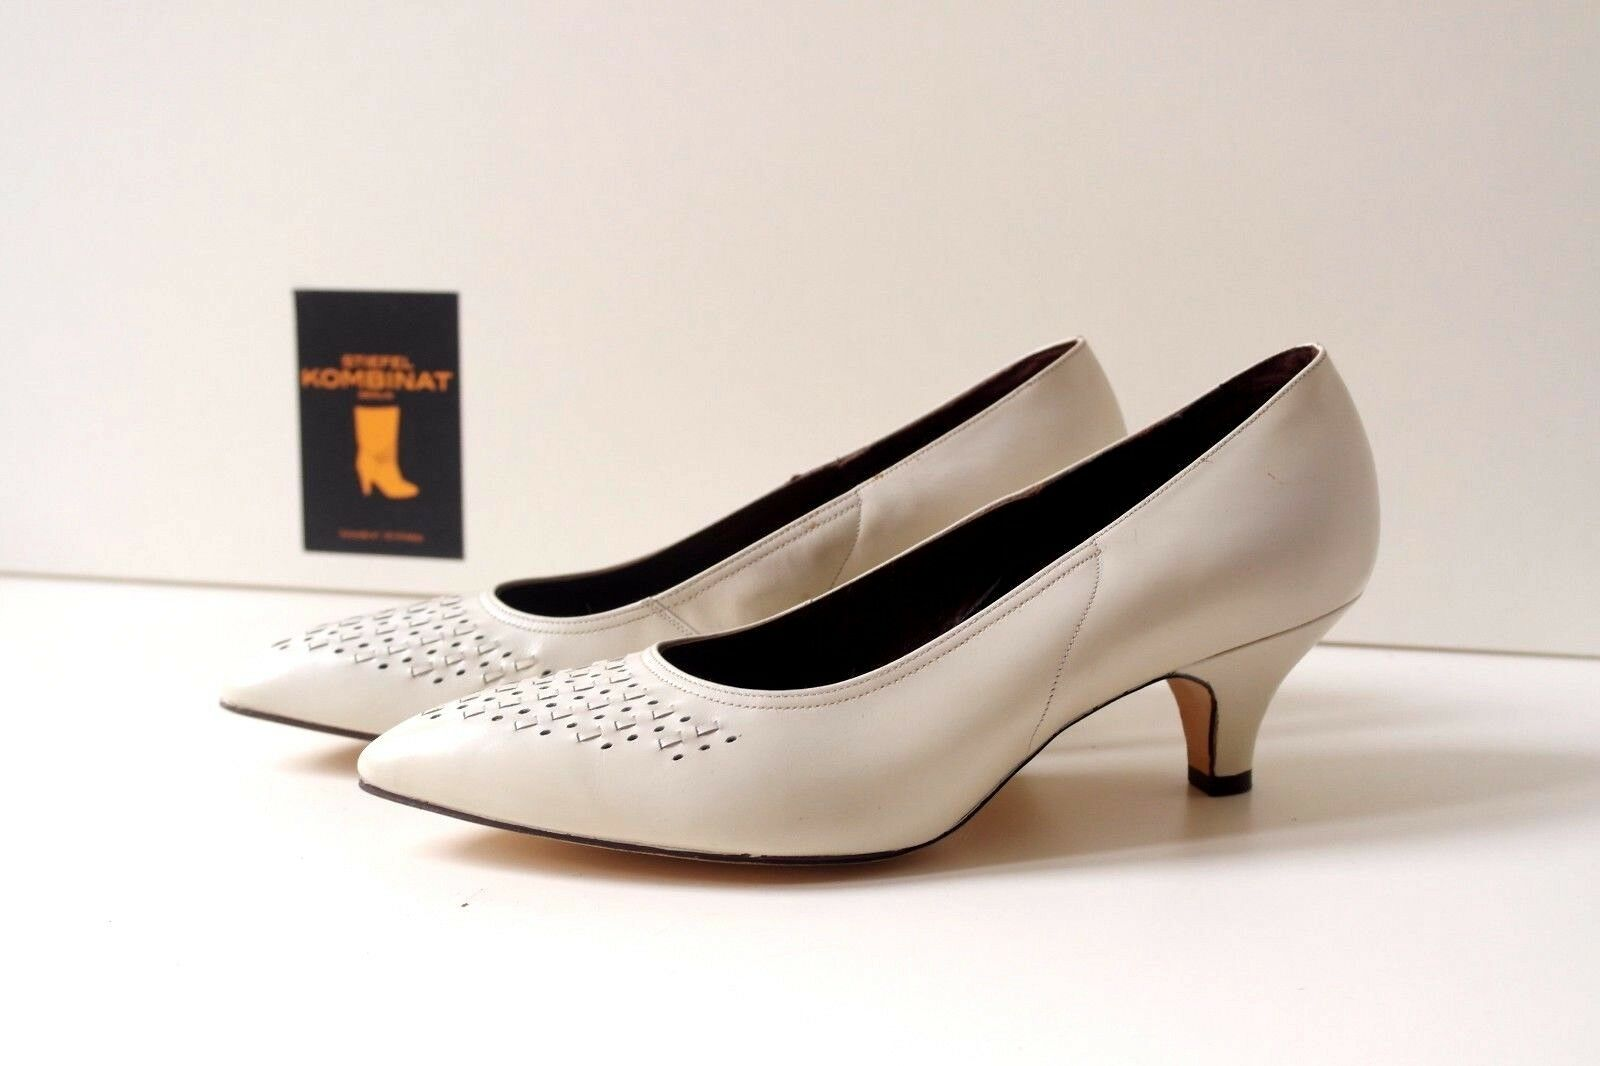 af3e4e911d56 Rhin Berger Berger Berger Madame femmes escarpins champagne jaridia  Chaussures True Vintage Chaussure | Art Exquis 649865